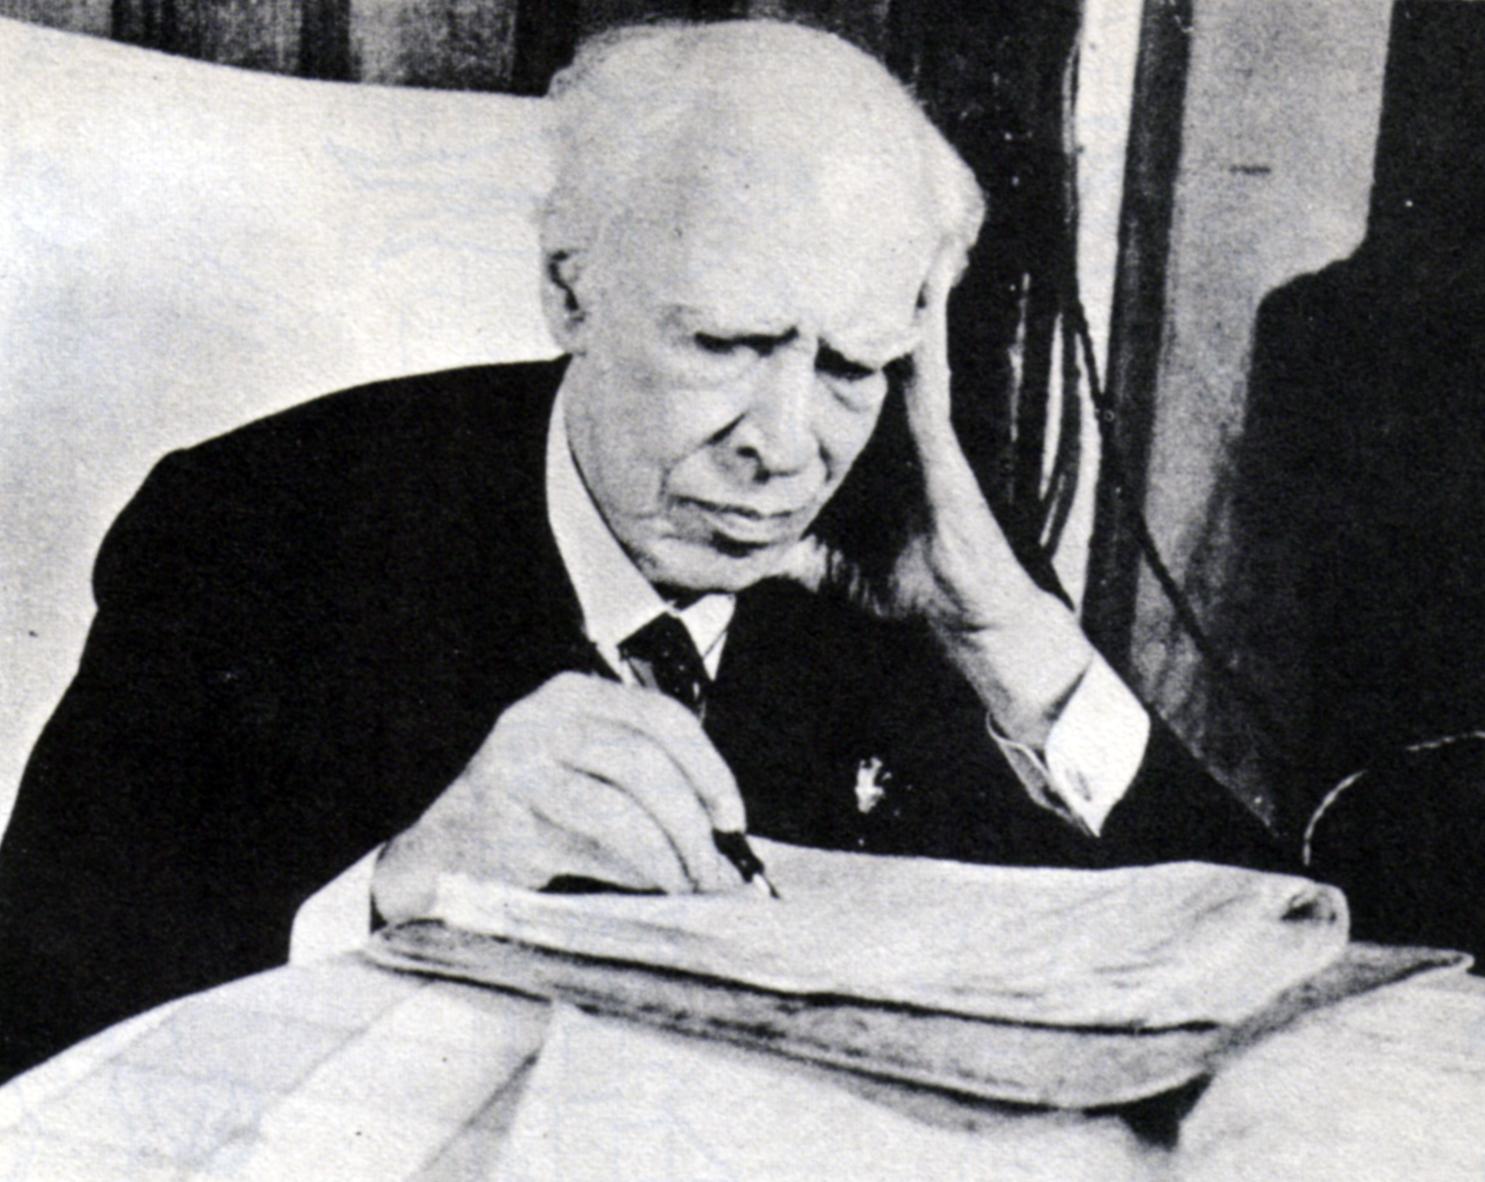 Stanislavski In 7 Steps: Better Understanding Stanisklavski's 7 Questions